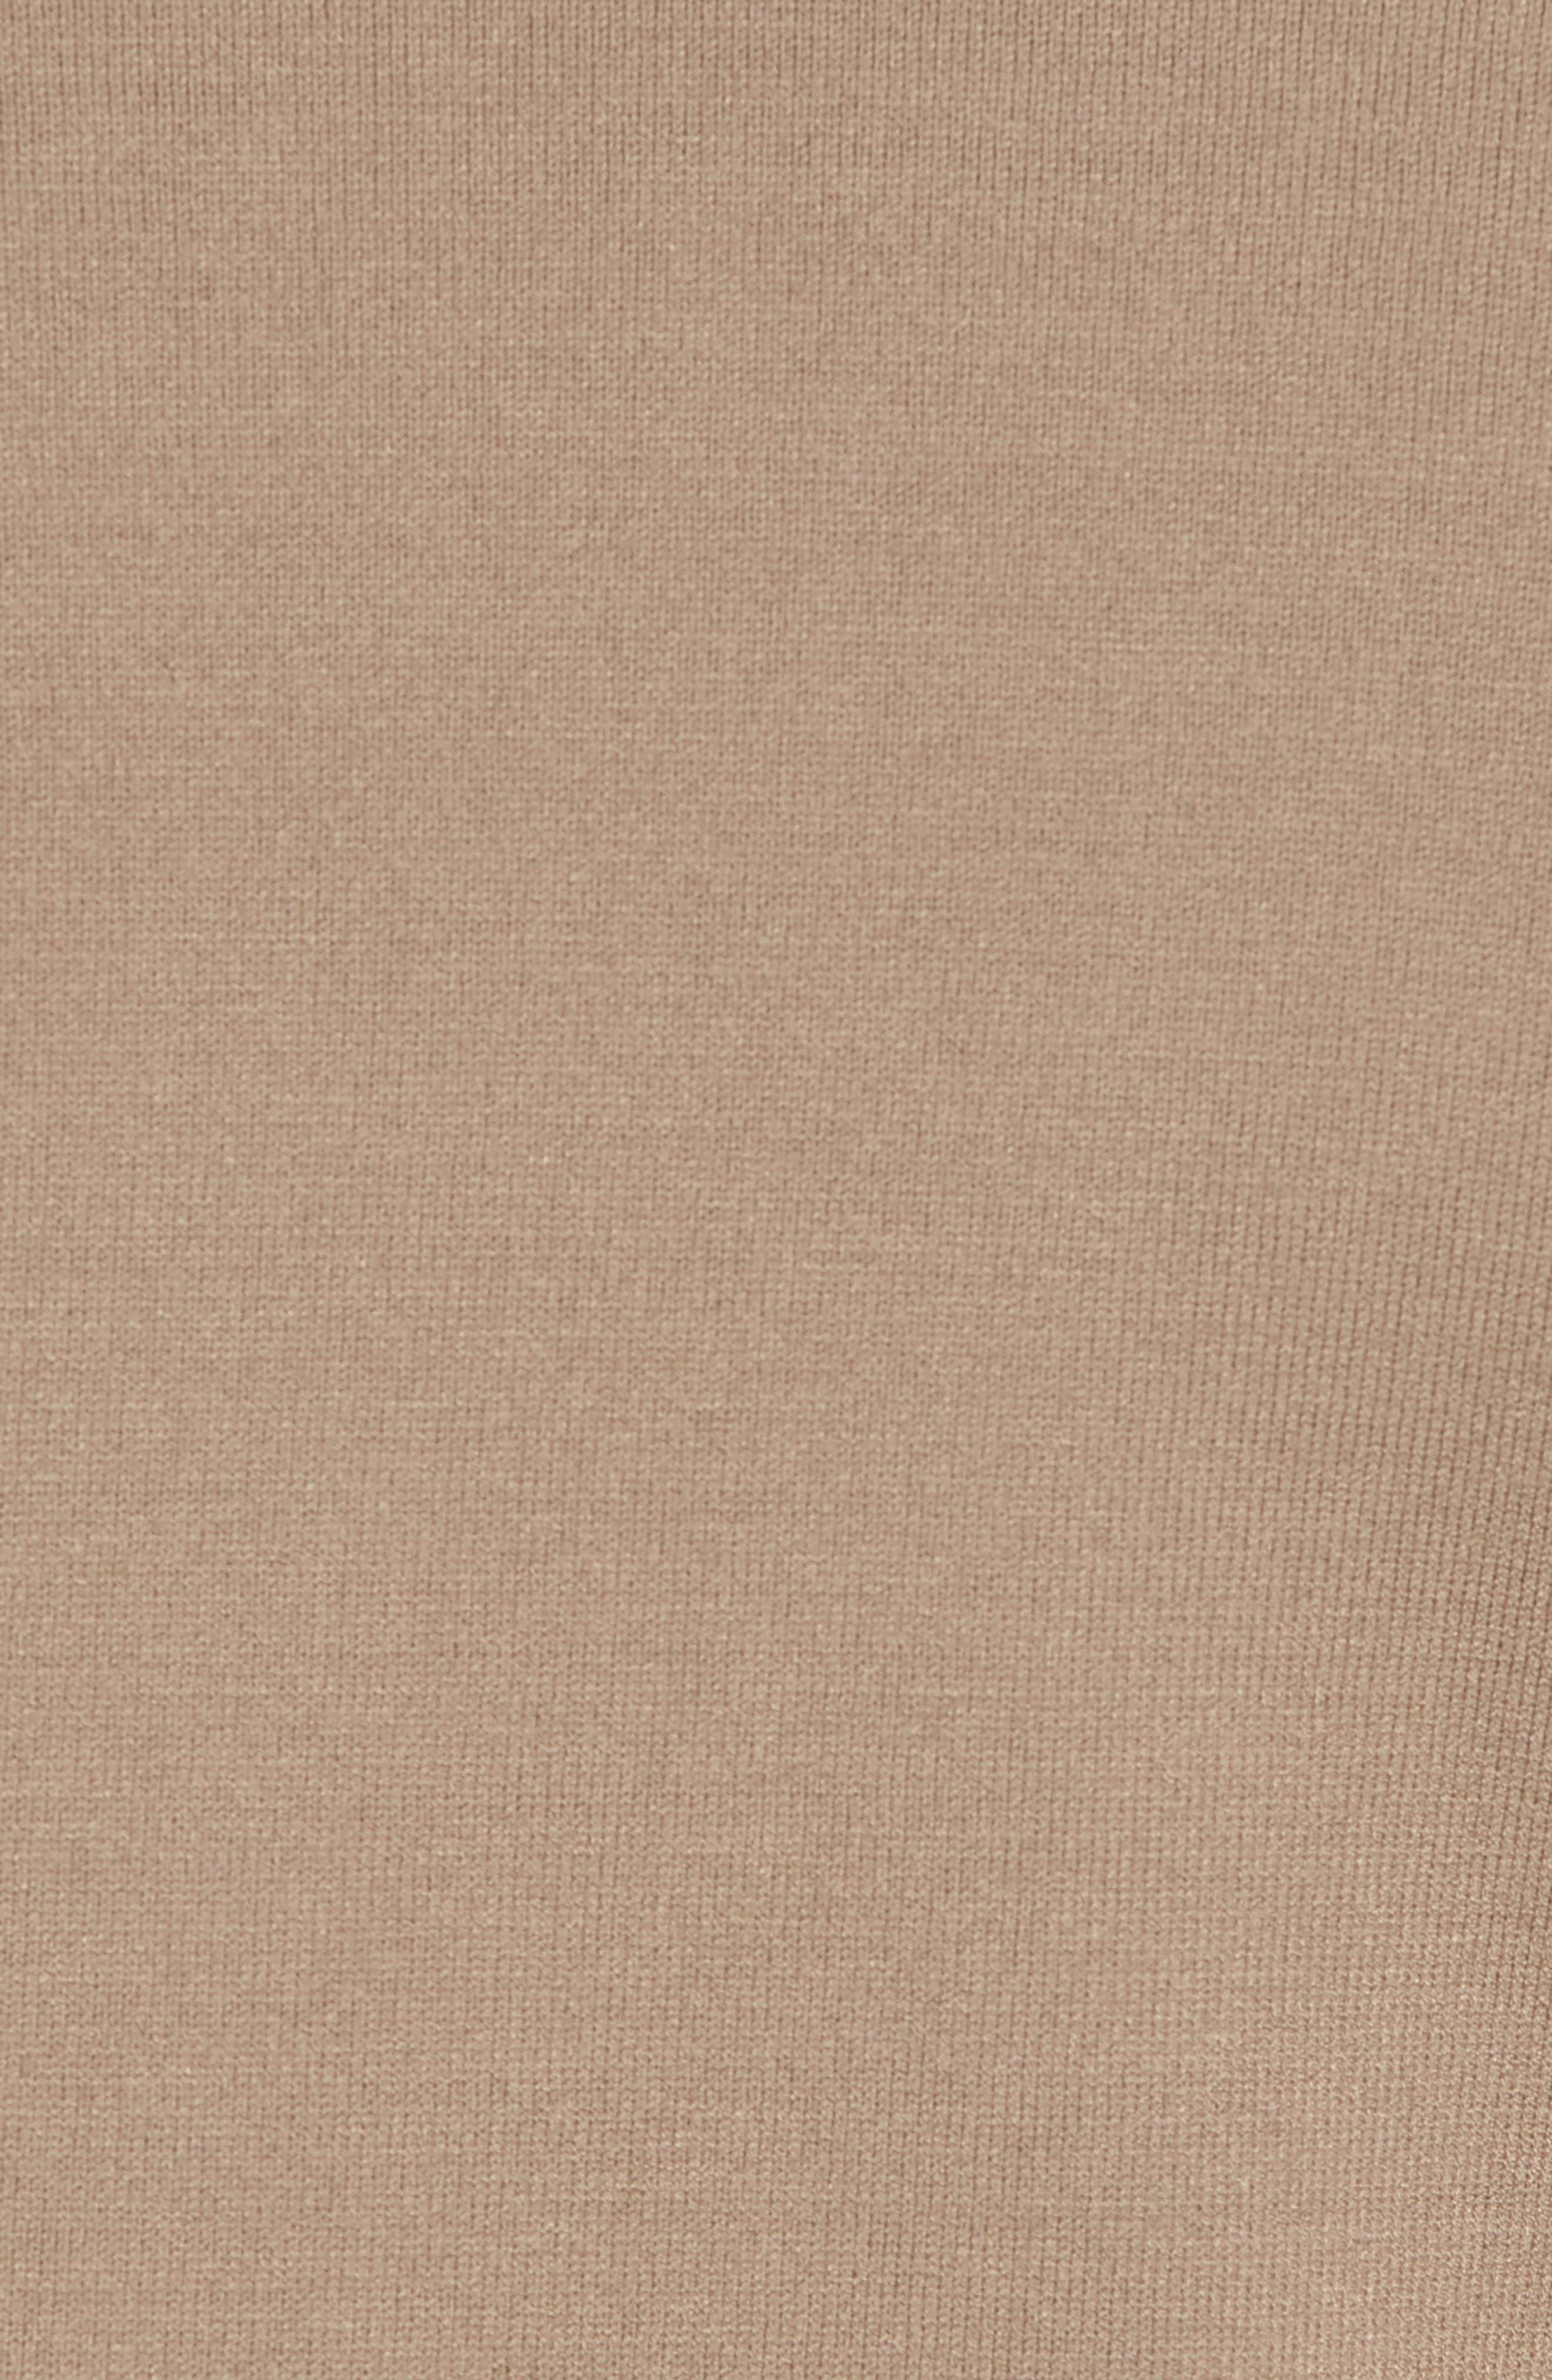 Track Stripe Crewneck Sweater,                             Alternate thumbnail 5, color,                             250